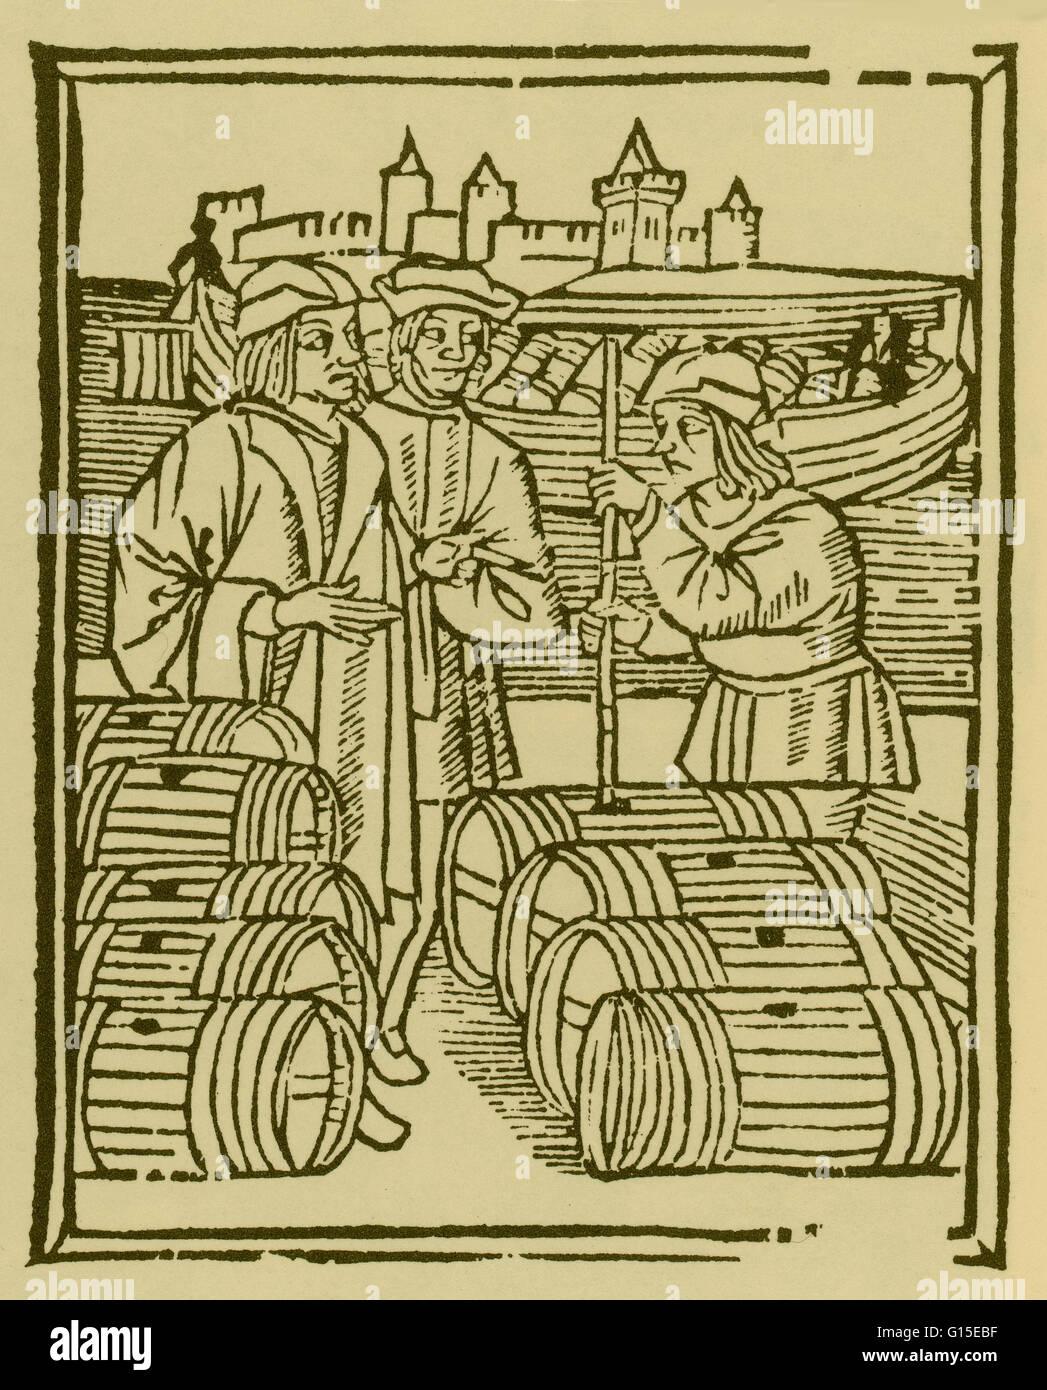 Scenes of a trade: wine merchant. Woodcuts, 1500/01, from Les Ordonnances de paris. - Stock Image